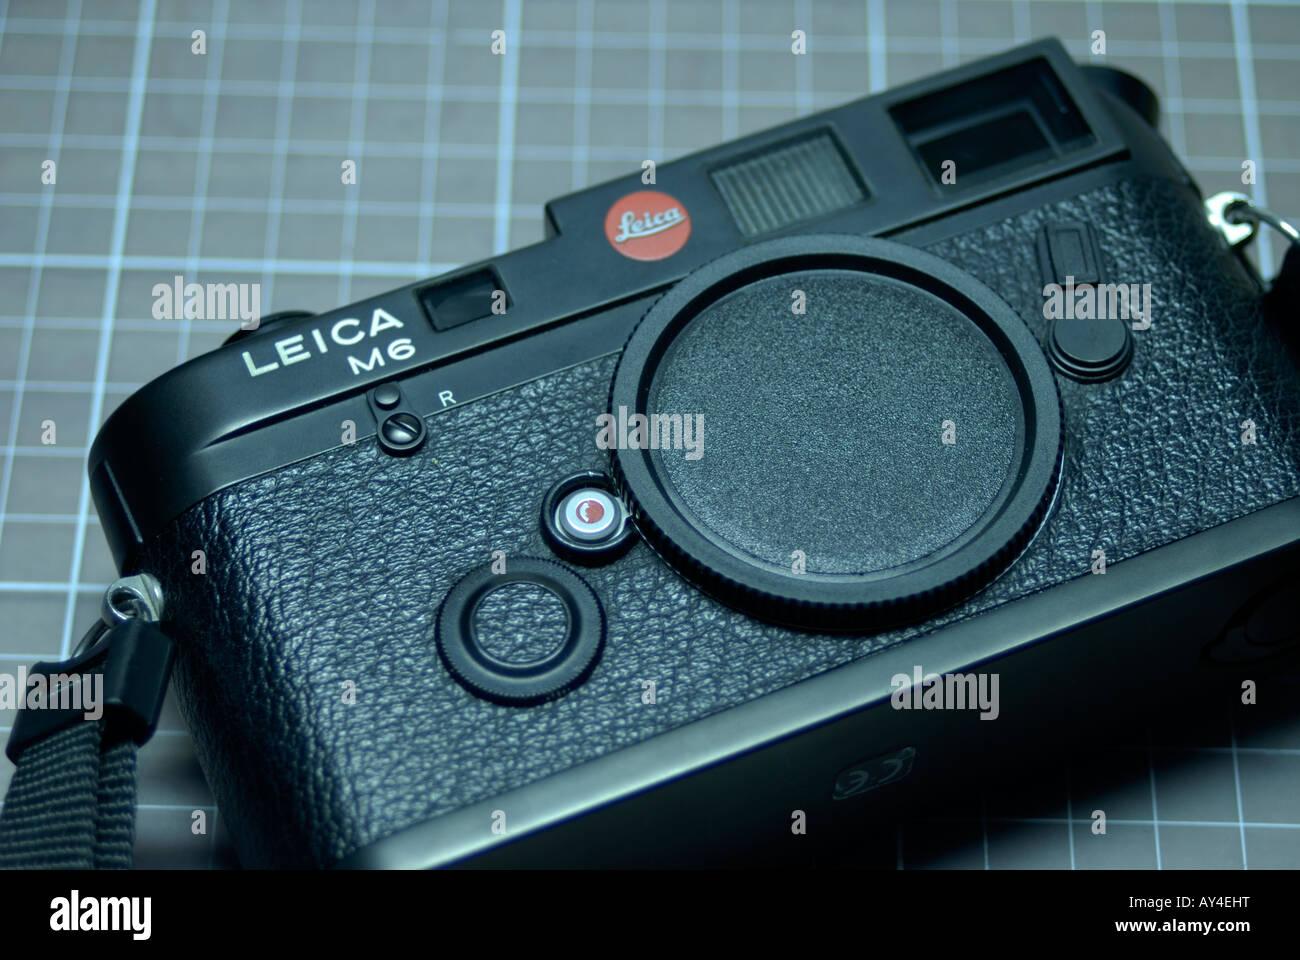 Leica M6 rangefinder - Stock Image